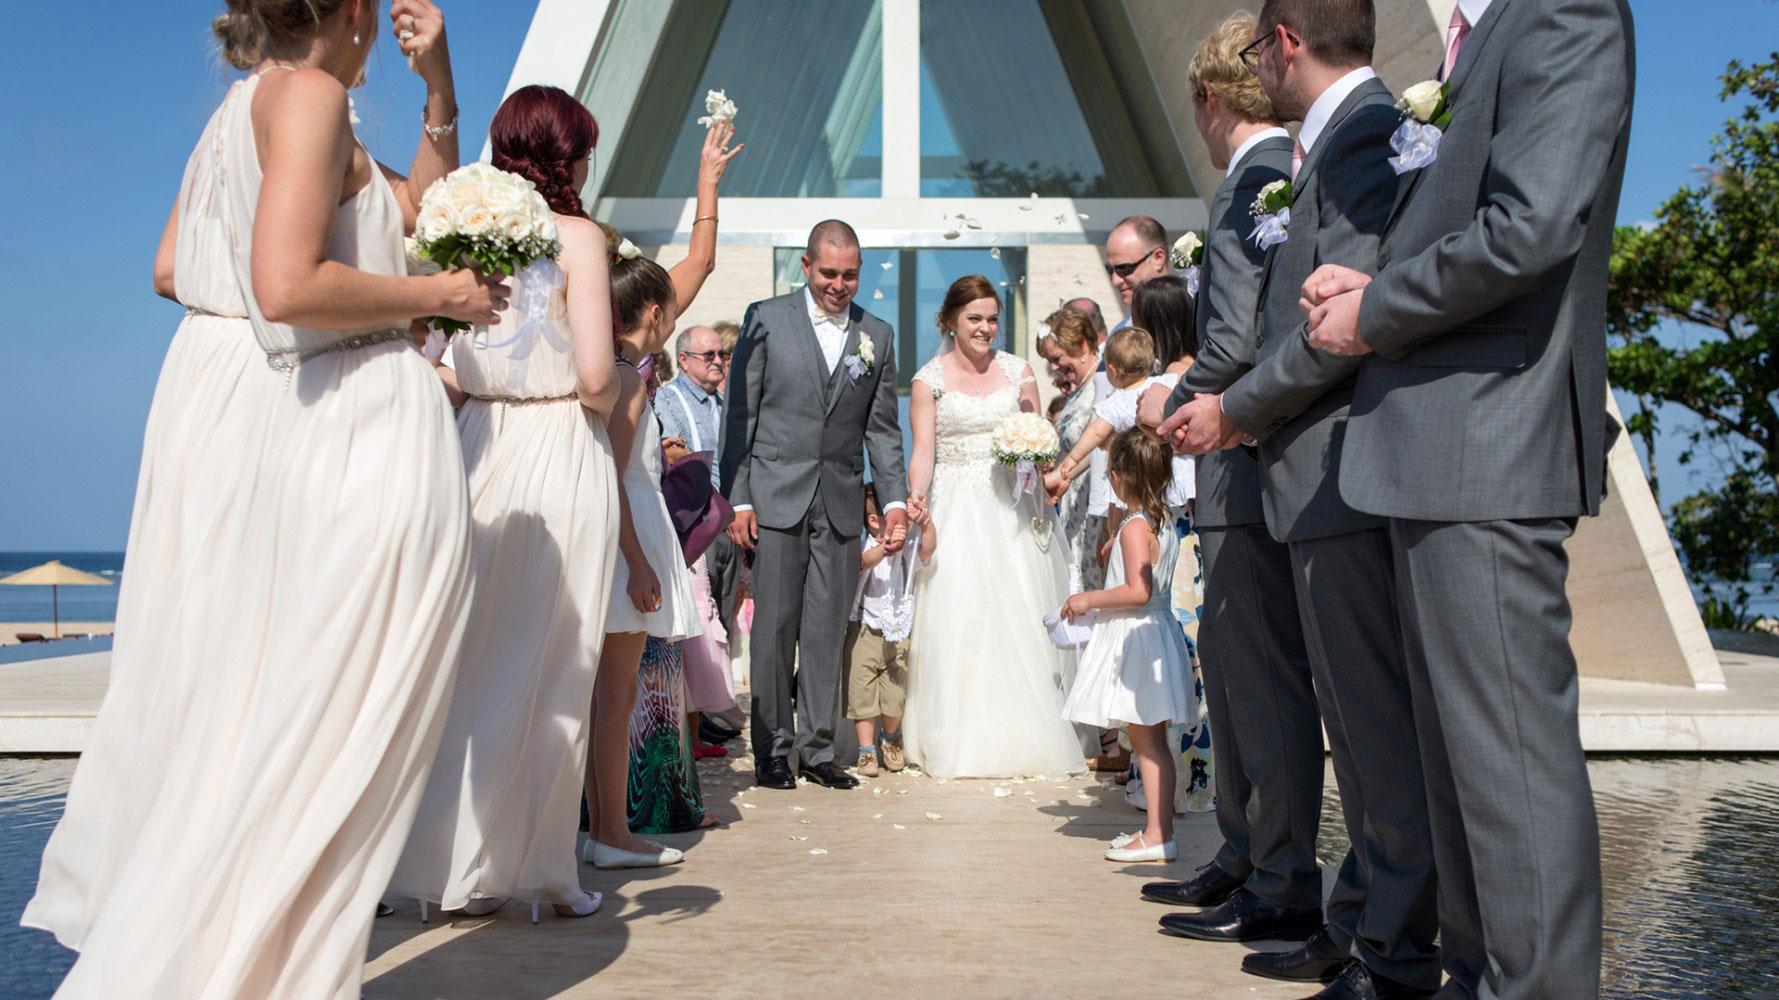 Jessica-Lemon-Photography-Adelaide-Wedding-Photographer-Chapel-Church.jpg